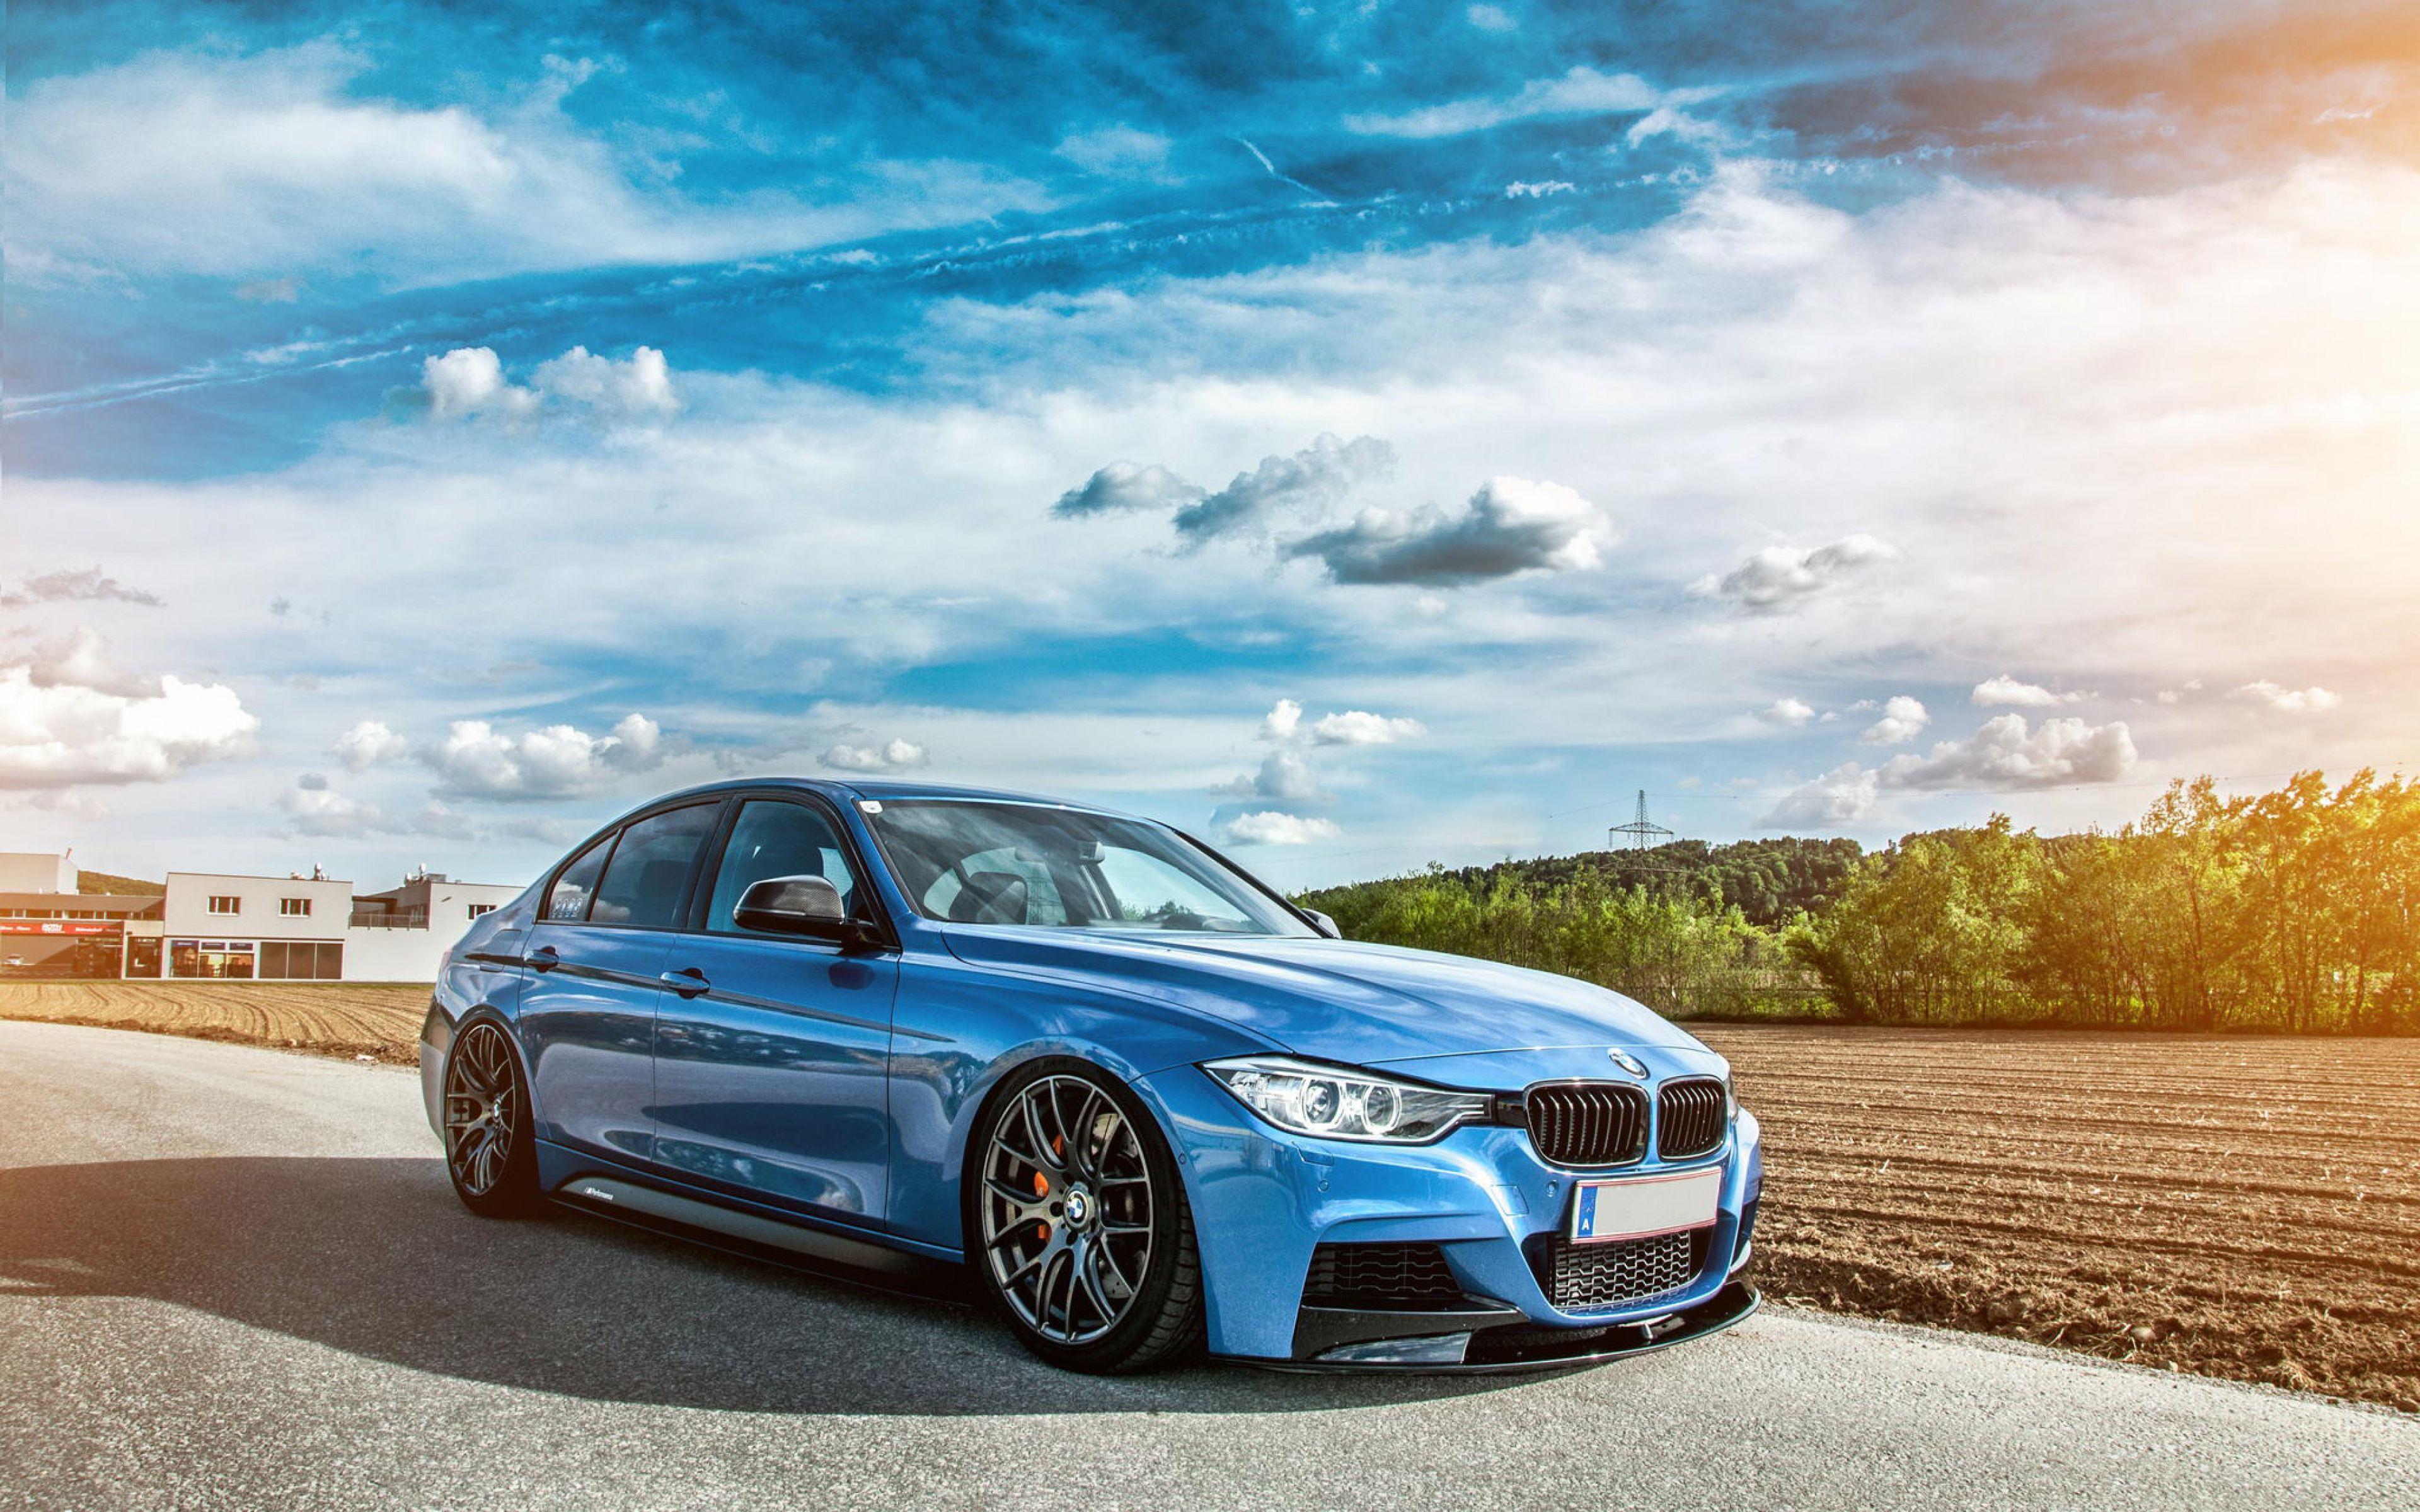 Ultra HD 4K Bmw Wallpapers HD, Desktop Backgrounds 3840x2400 | BMW | Bmw wallpapers, BMW, Car ...